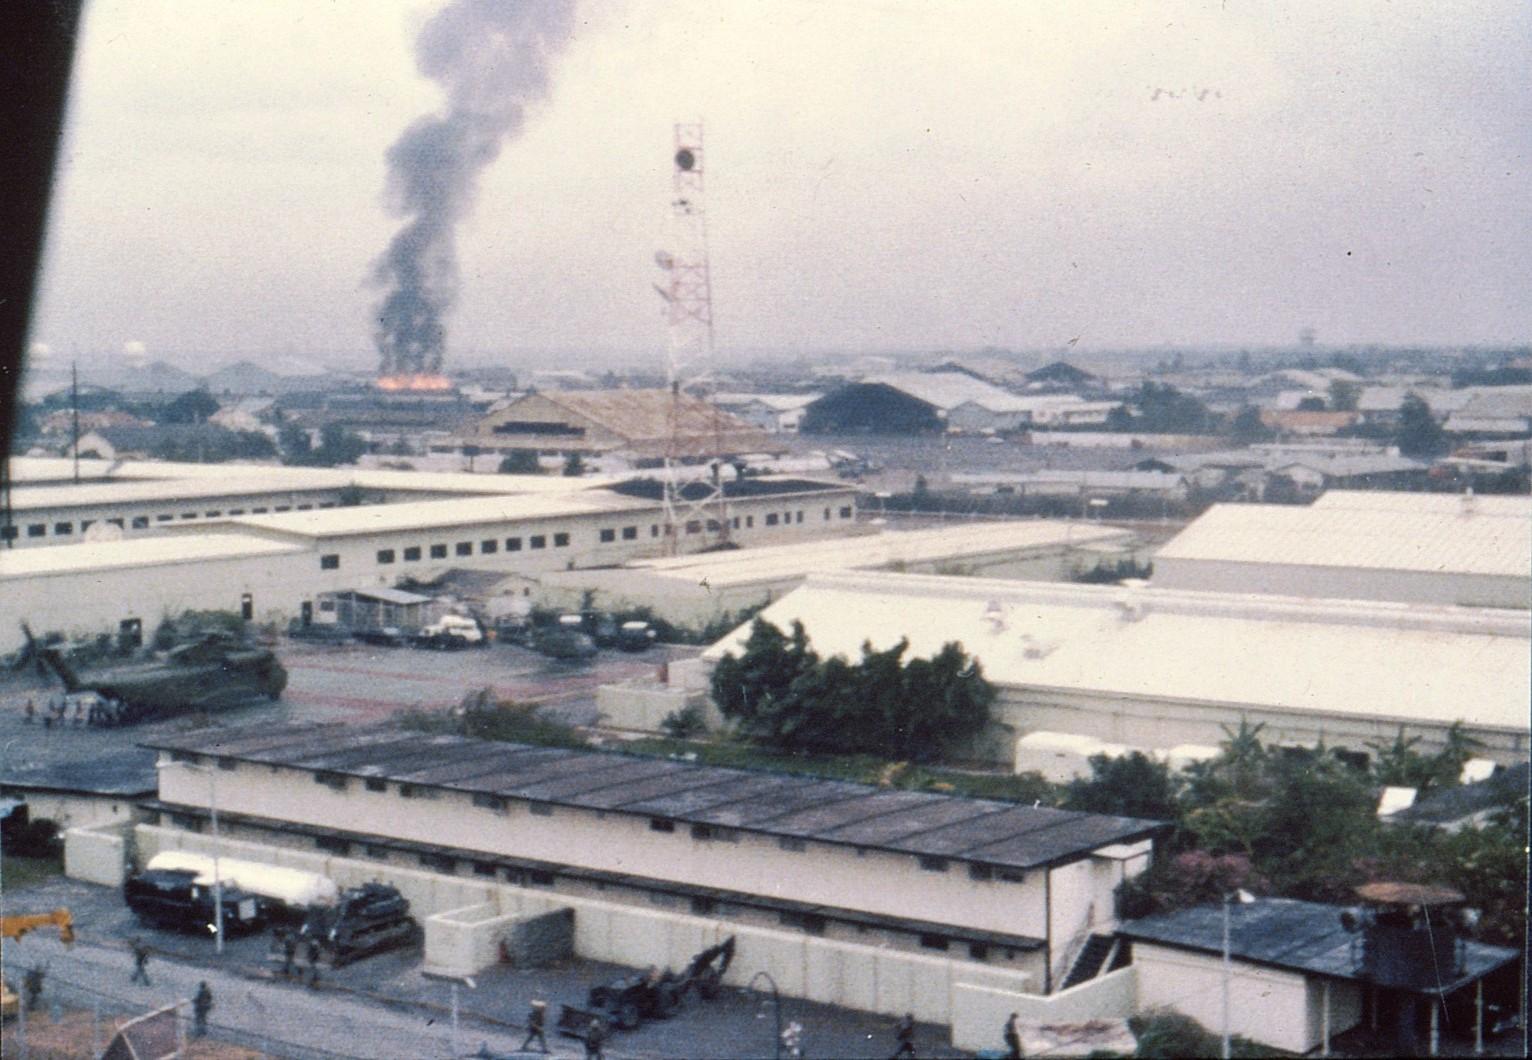 Tan Son Nhut April 29, 1975.jpg